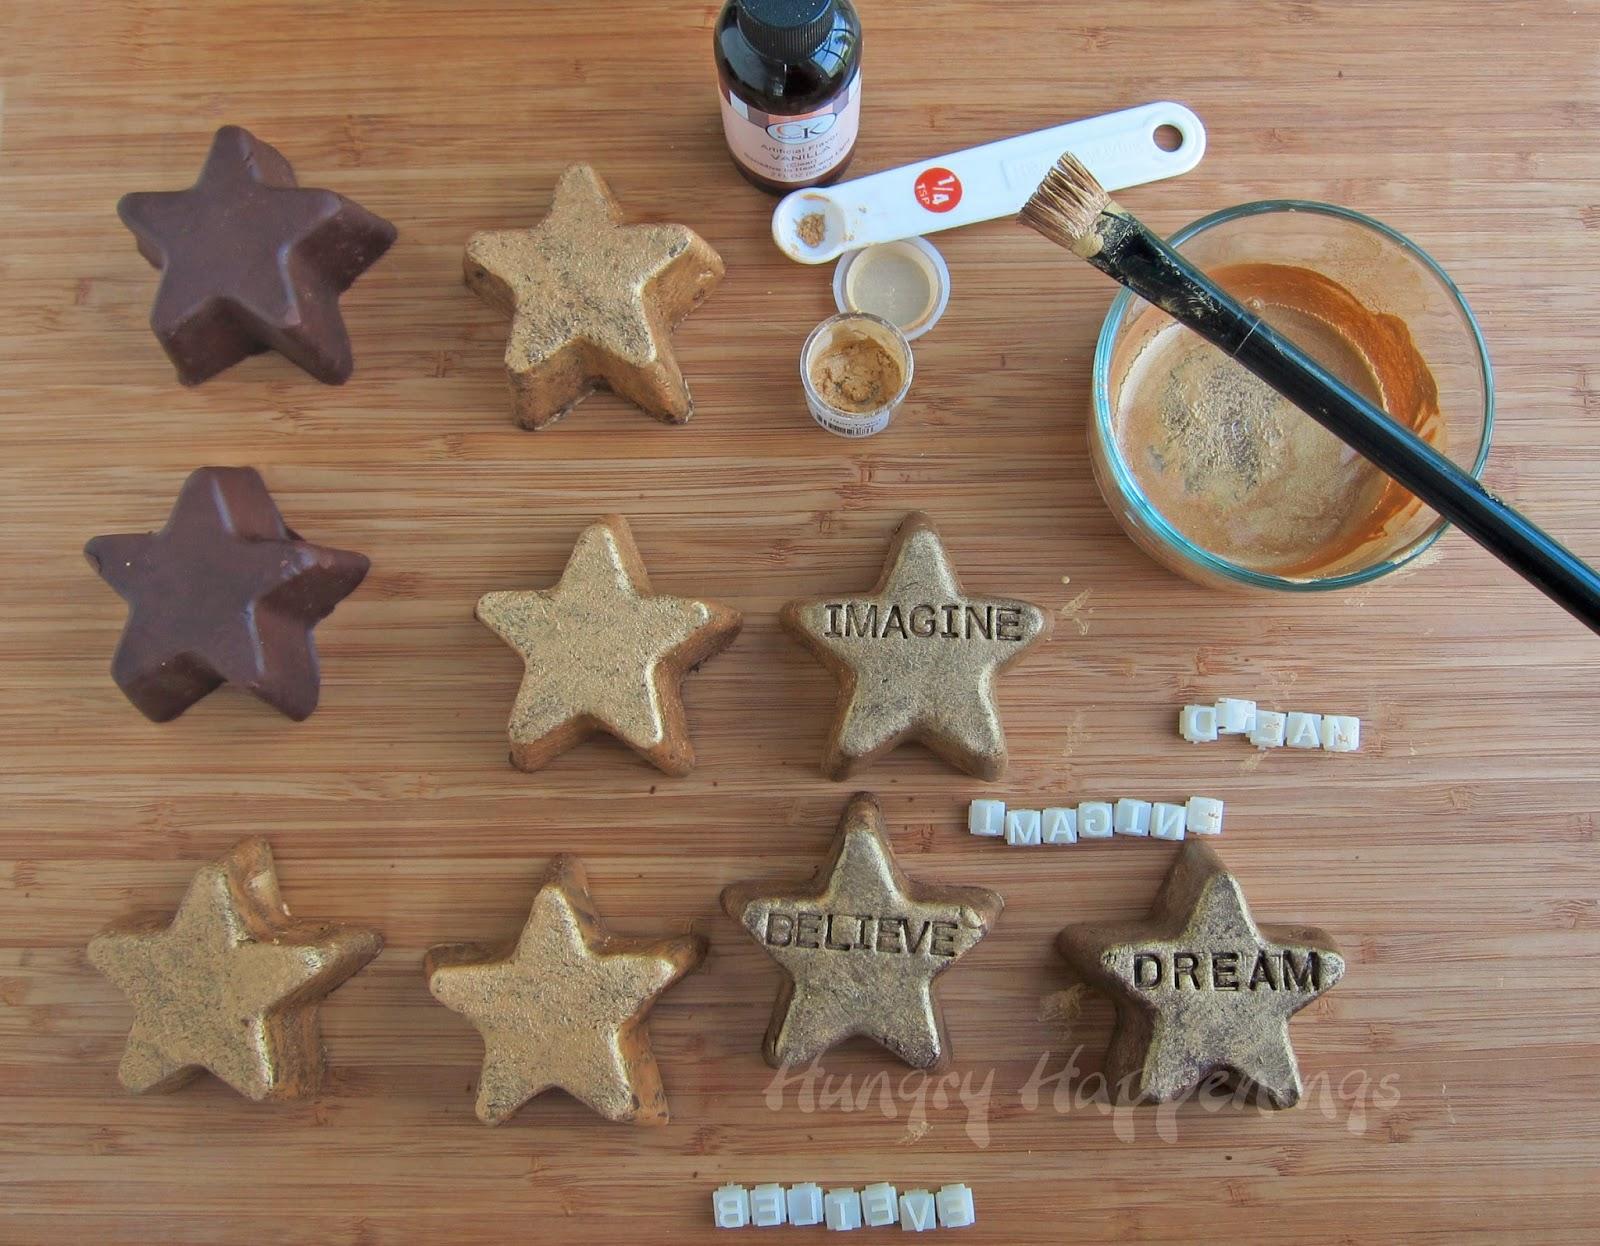 fudgy-gold-stars-graduation-gifts-teacher-gift-ideas+.jpg